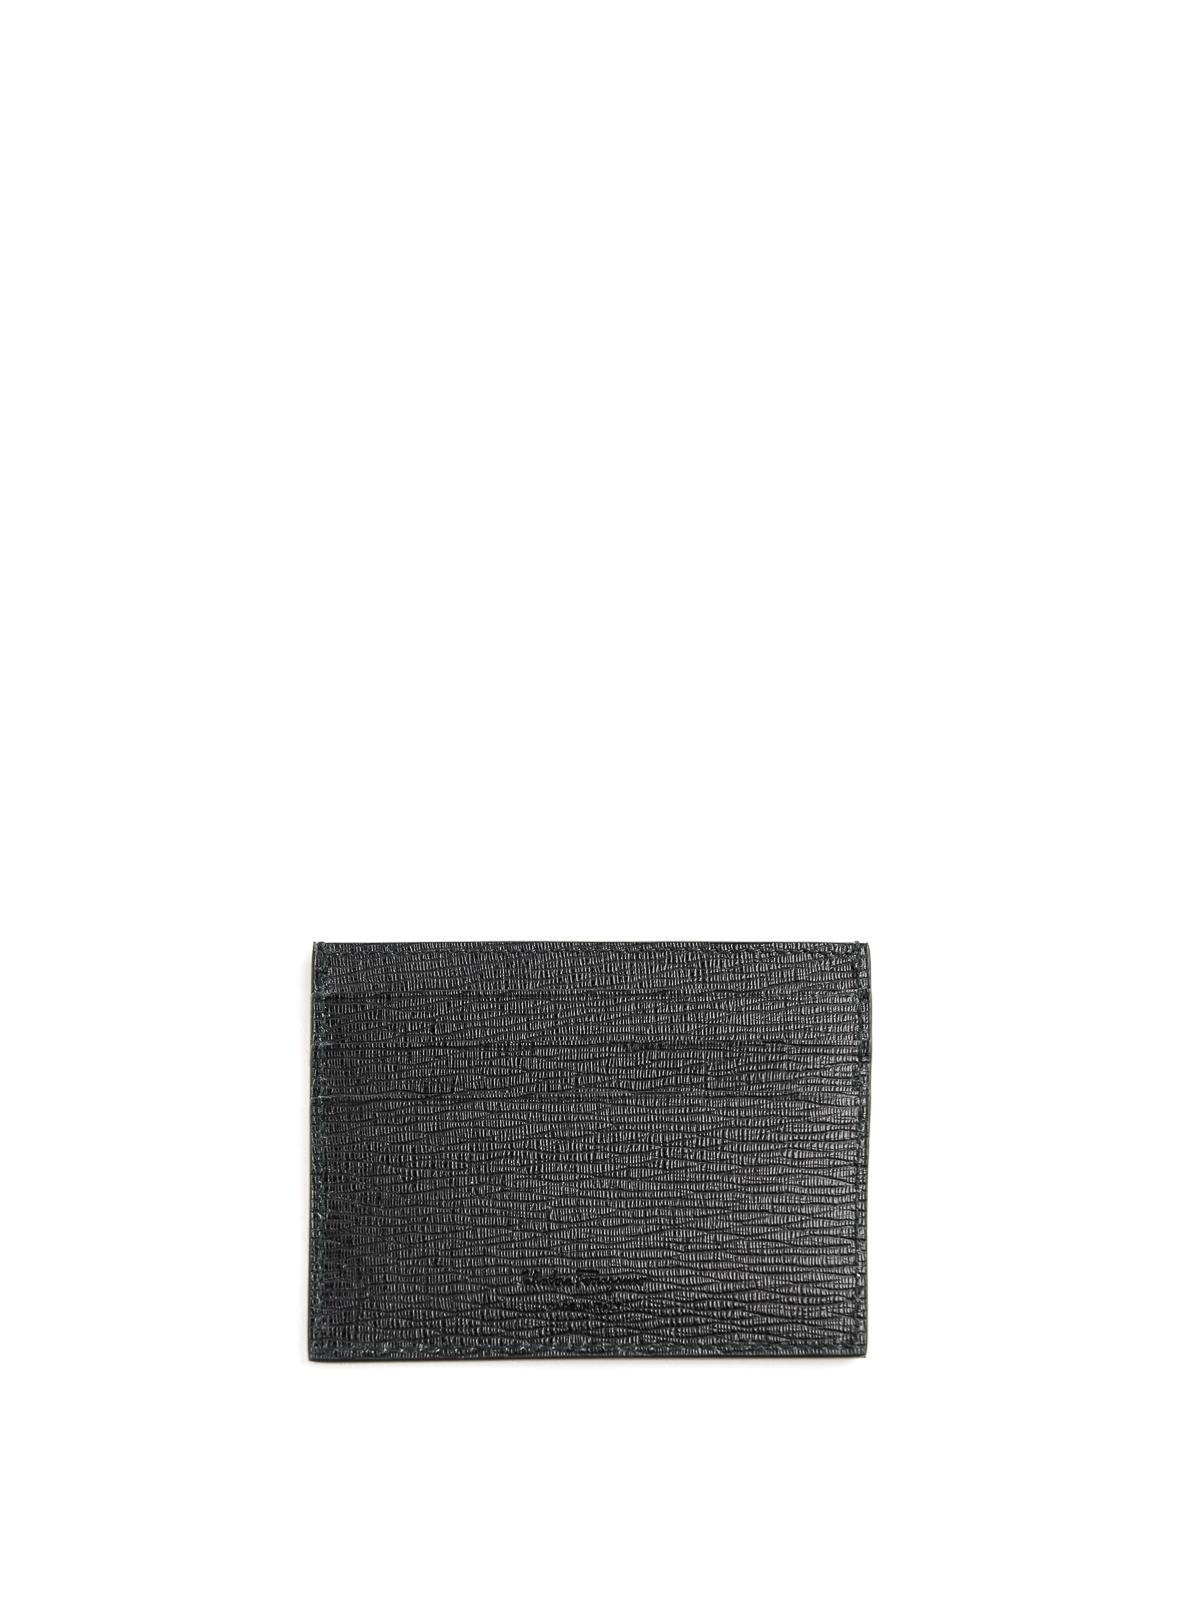 separation shoes 2c33e 400ae Salvatore Ferragamo - Gancini logo textured leather card holder ...